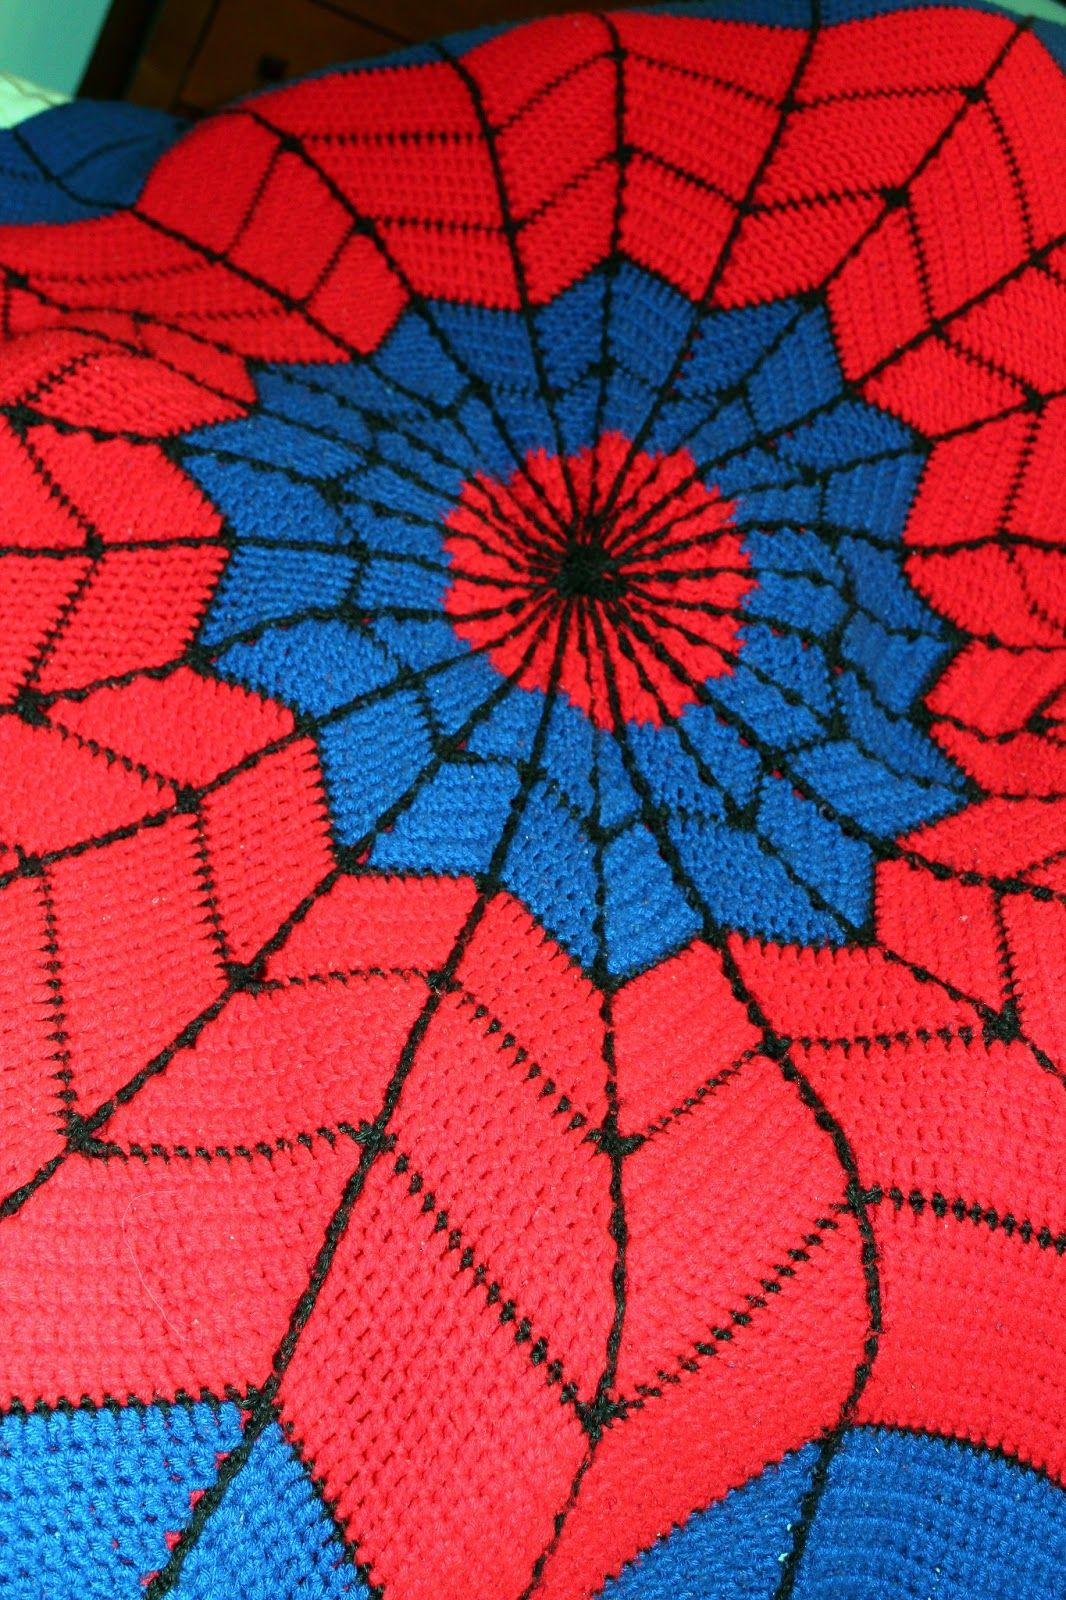 free crochet pattern spiderman afghan - Google Search ...